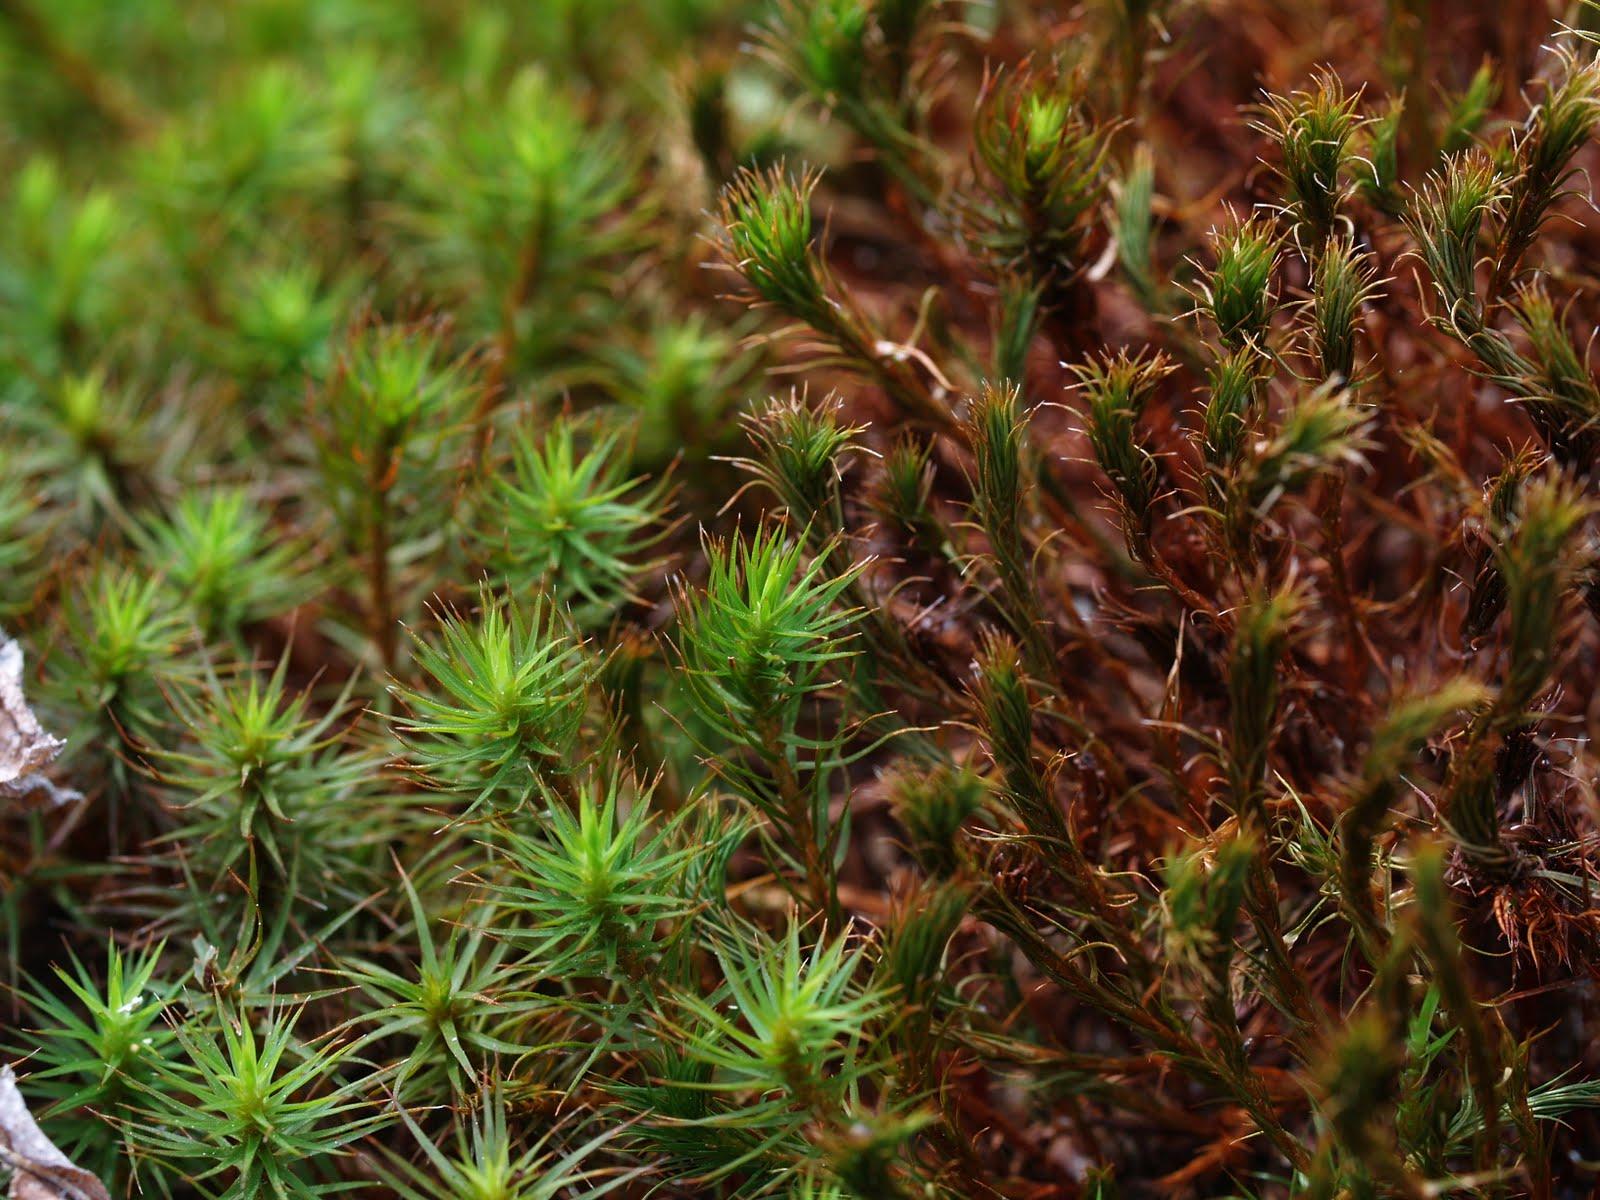 hight resolution of winter mosses 2009